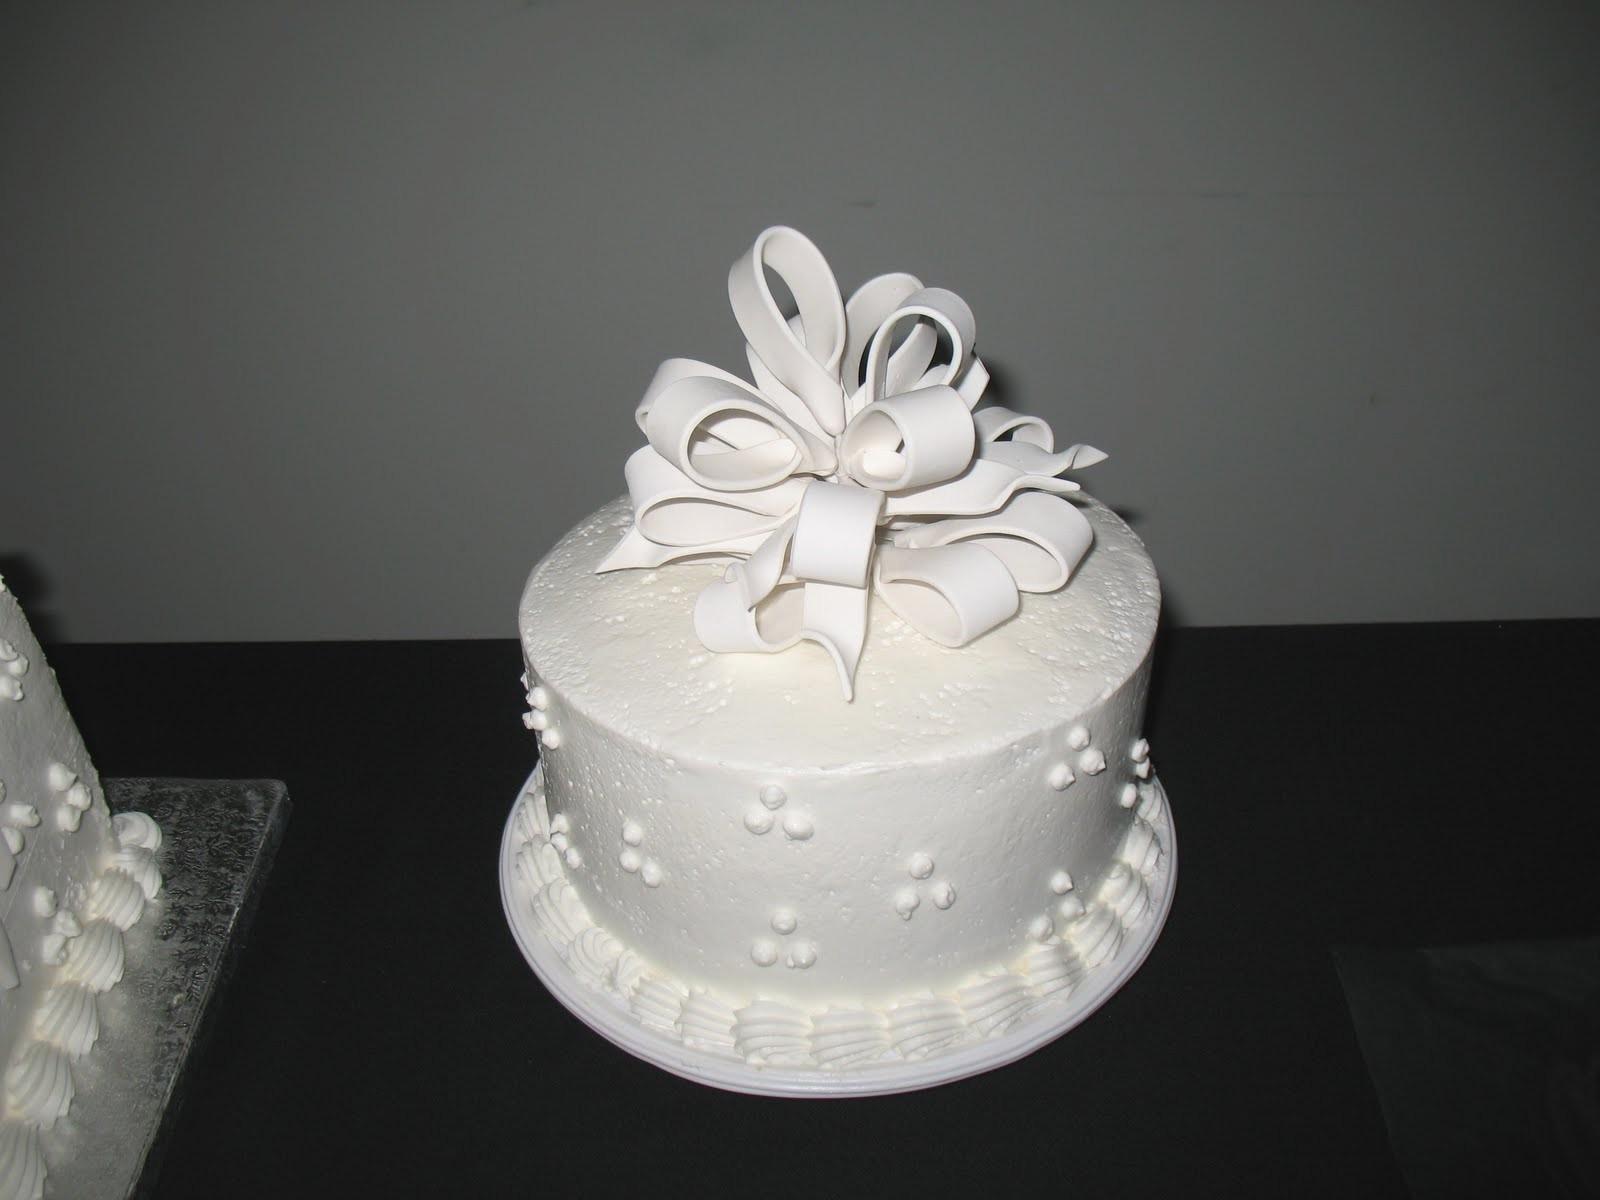 Publix Wedding Cakes Prices 2017  Easy Publix Wedding Cakes Prices